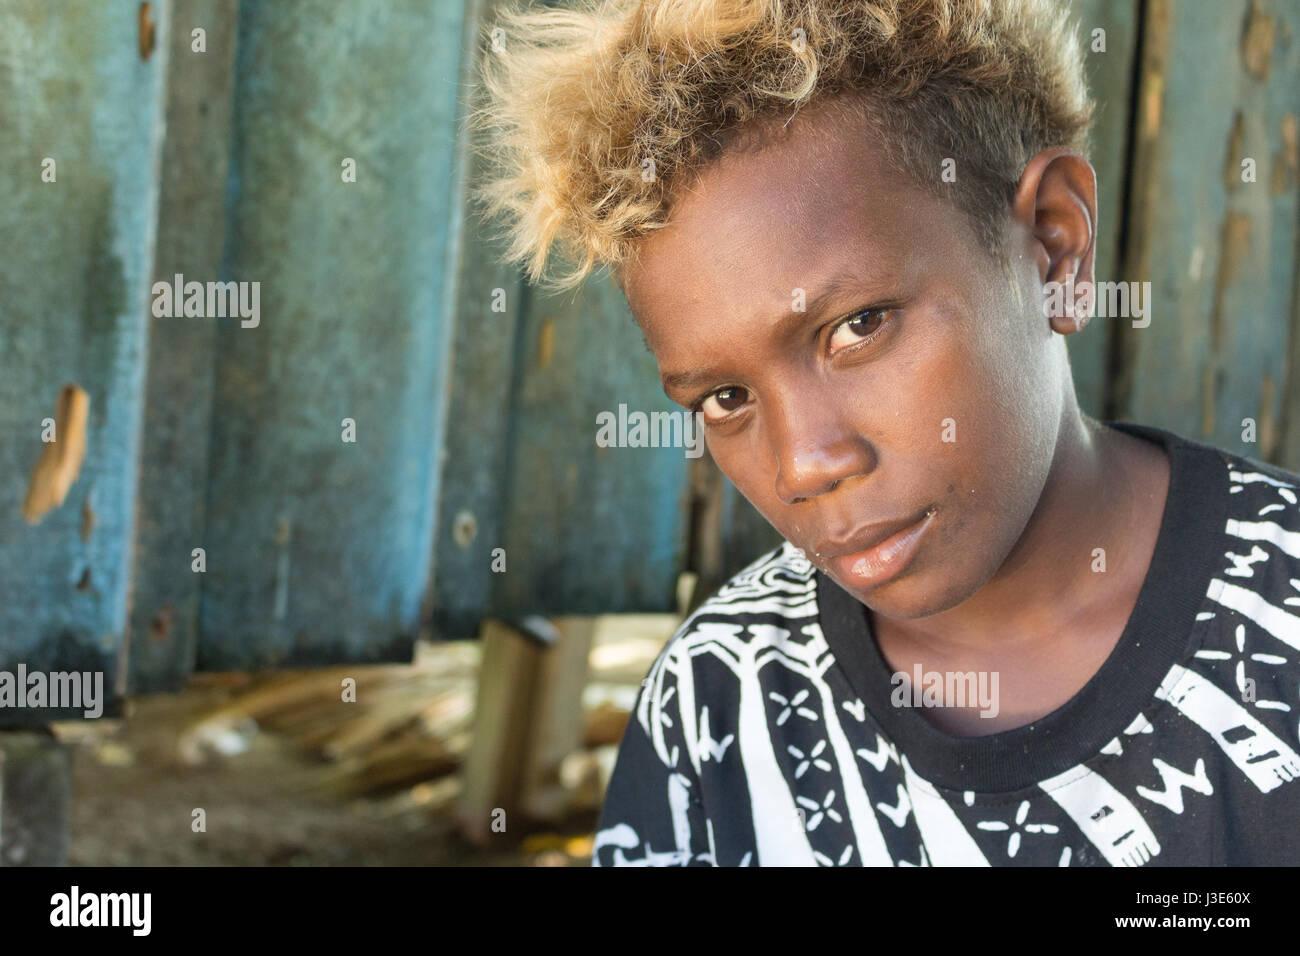 Santa Ana, Solomon Islands - March 6th, 2017: A melanesian boy portrait, looking at camera, Santa Ana, Solomon  - Stock Image